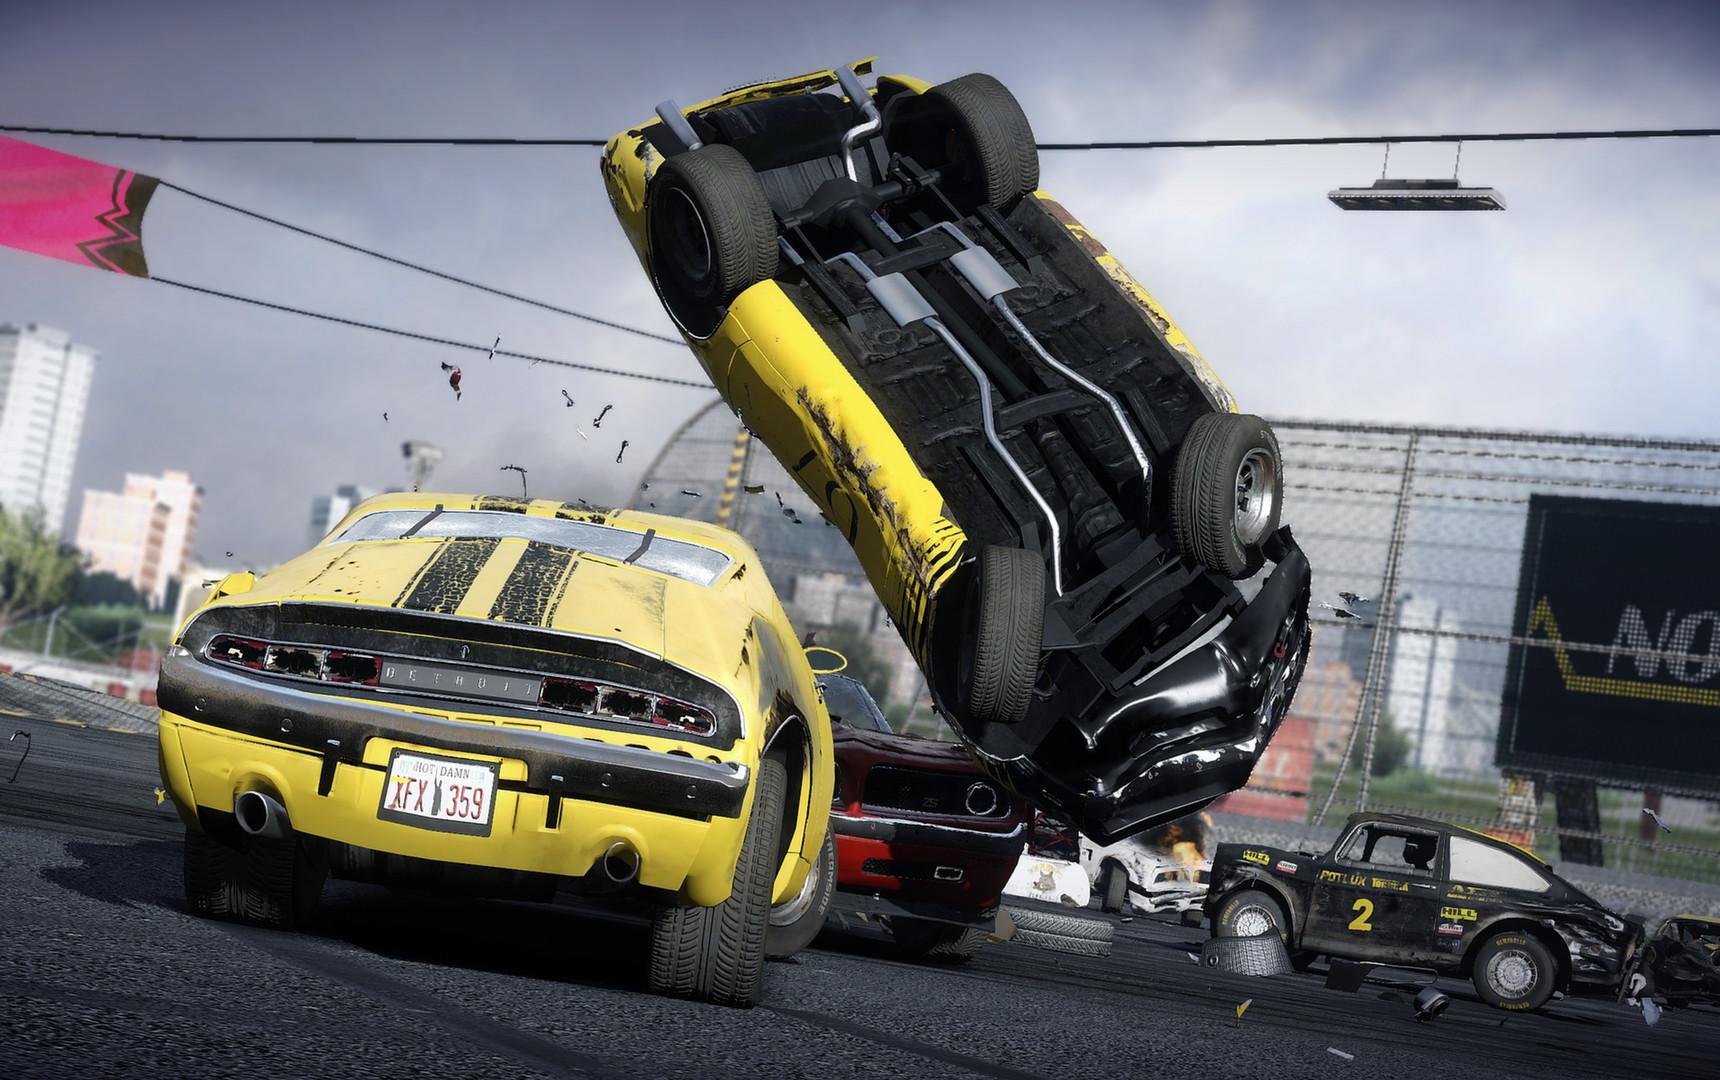 Next Car Game: Wreckfest Windows - Mod DB